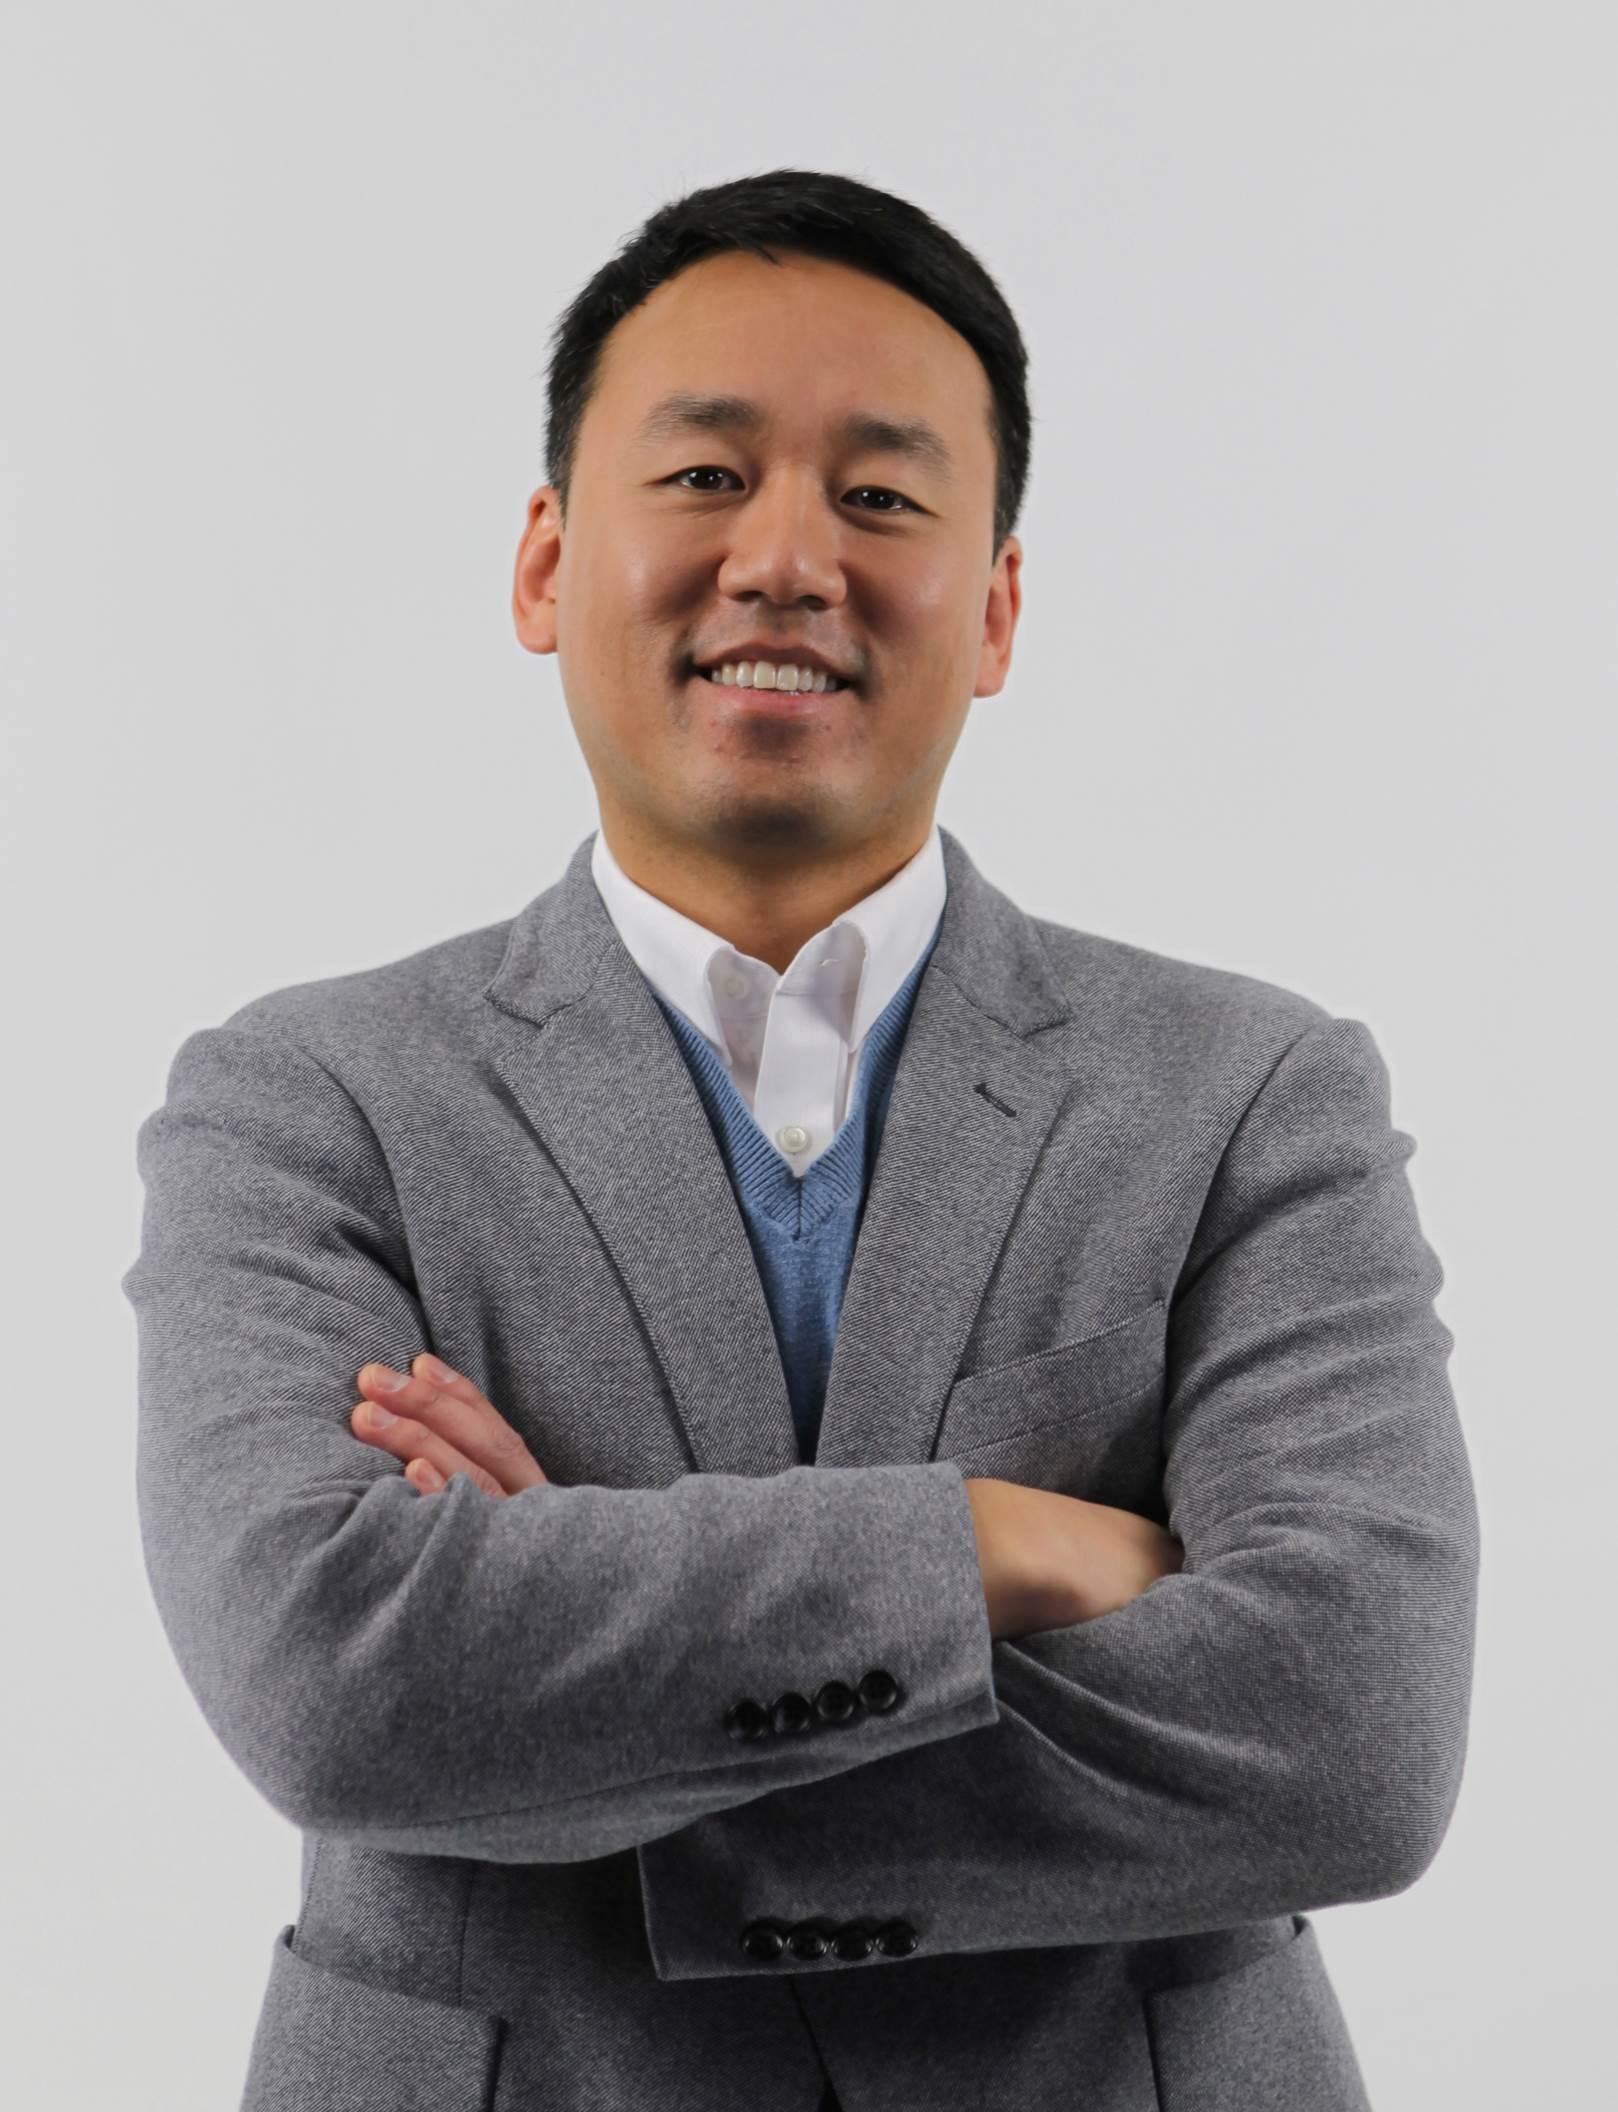 Joe Yun<br>Social Media Lab, Technology Services<br>University of Illinois